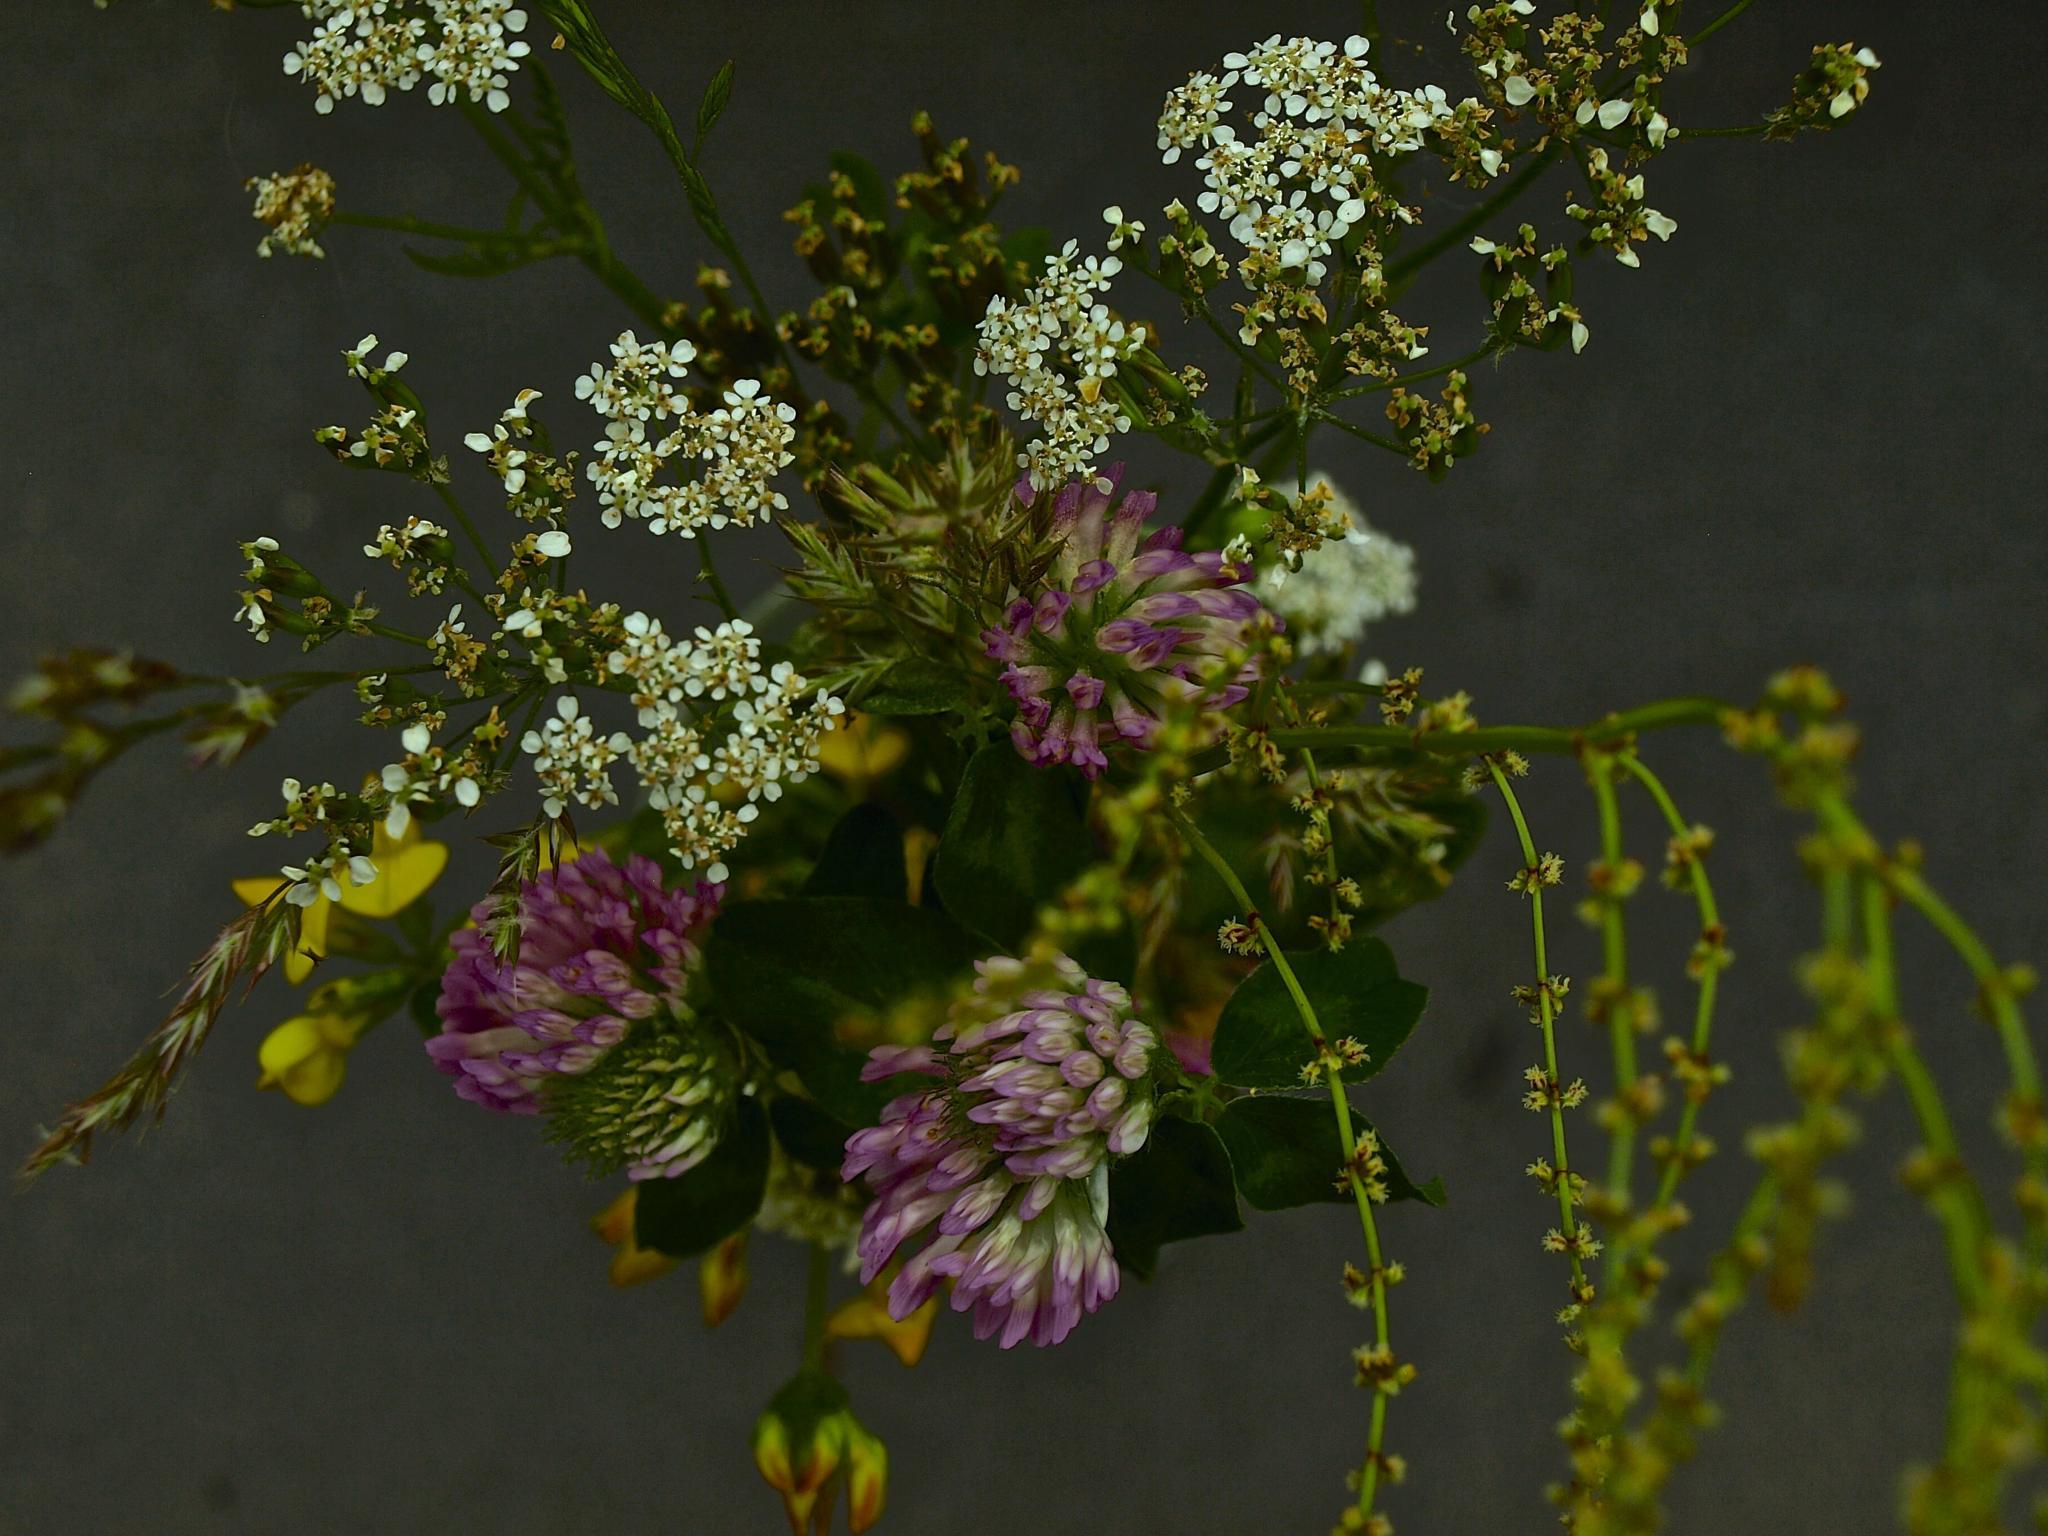 wild flowers by lisbeth.westergaard